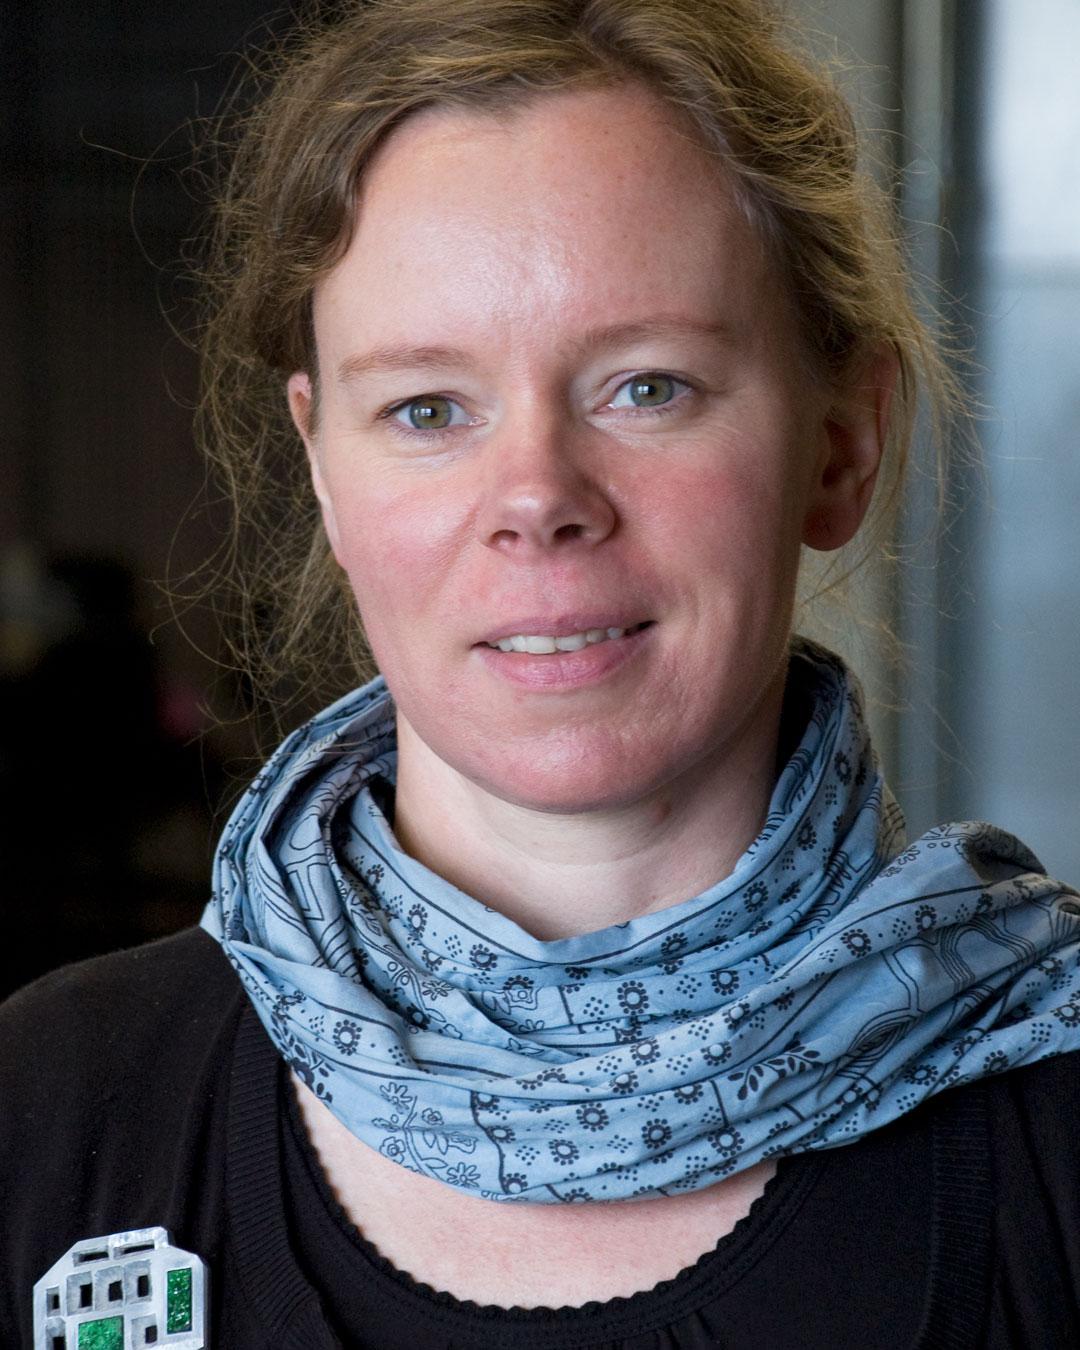 Sybille Richter, 2009. Foto Galerie Marzee, portret